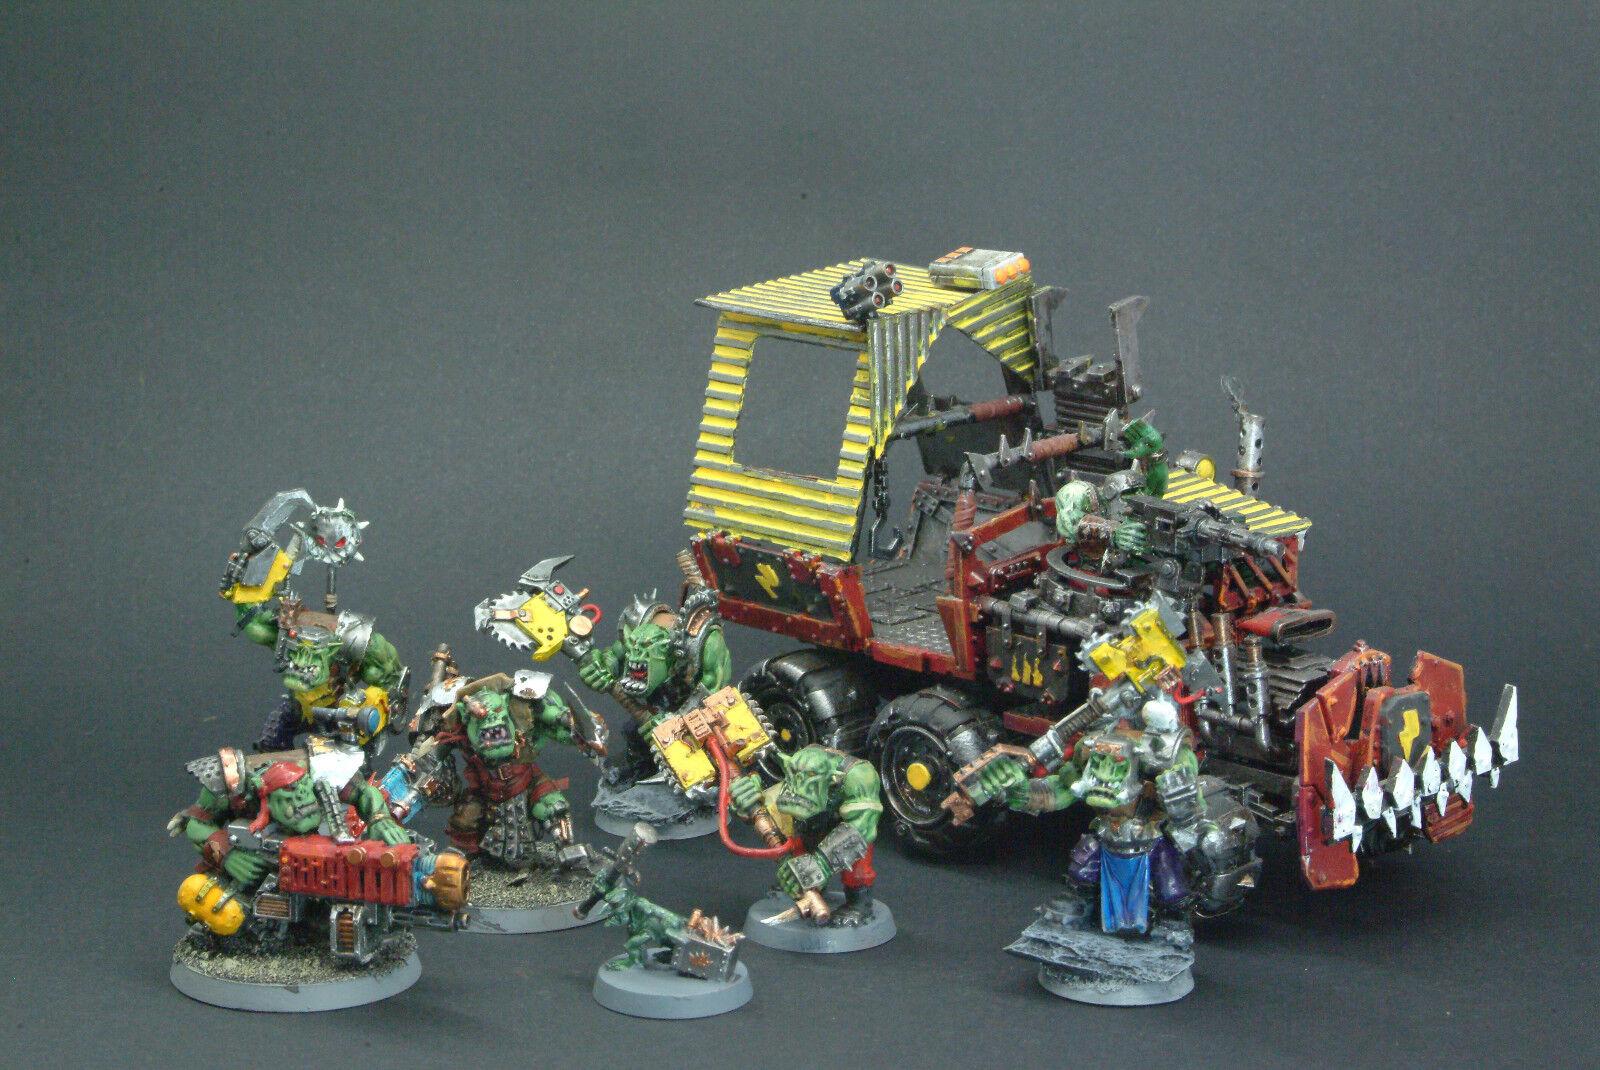 Gorkamorka Warhammer 40k Ork WARBAND pintado por radio de equipo